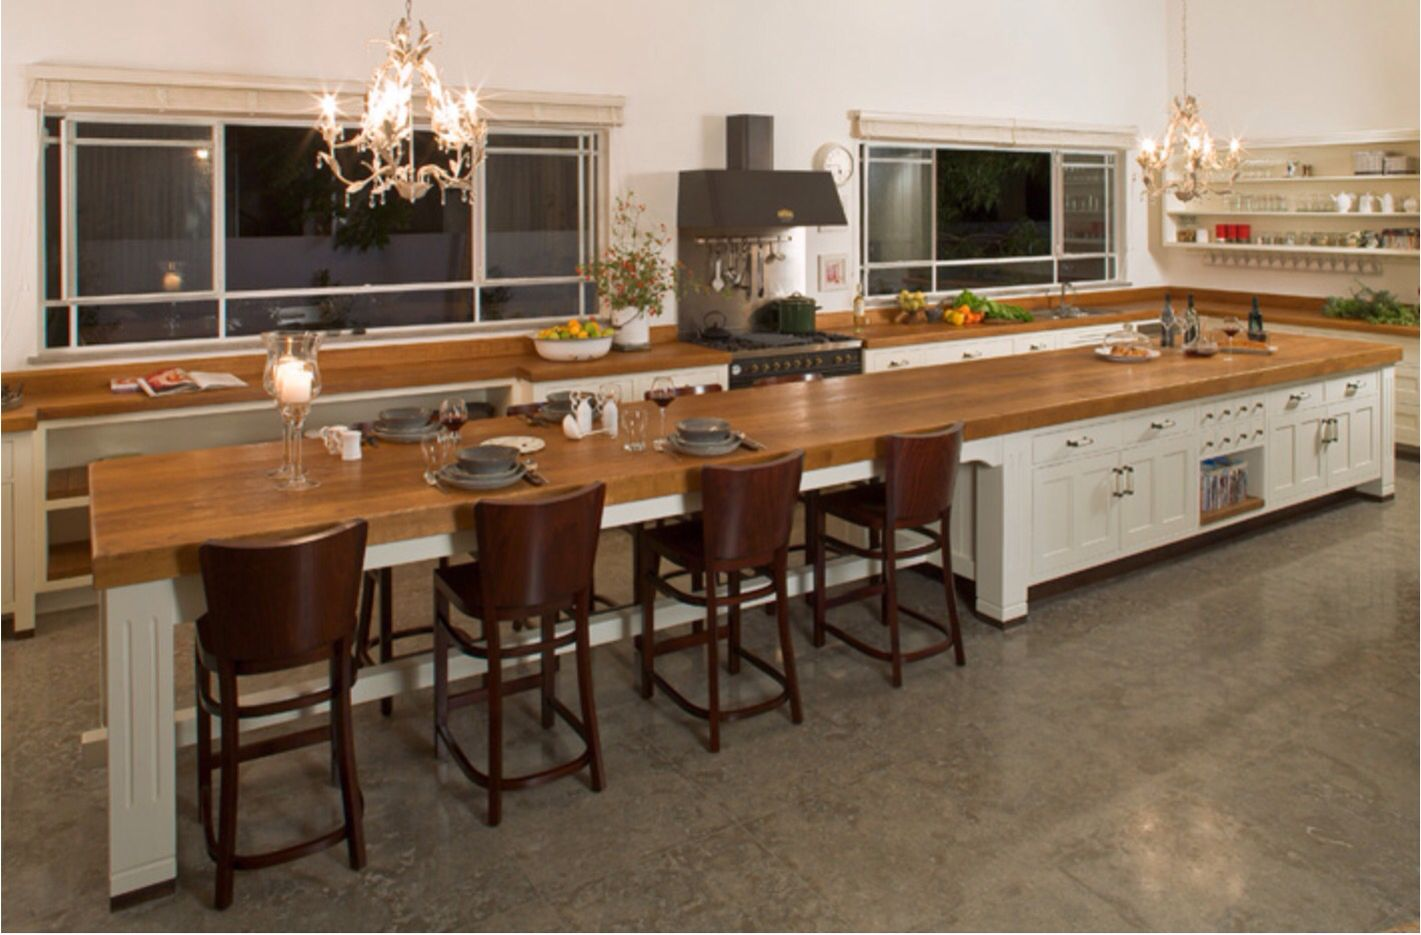 Wood, Long Island Kitchen design small, Narrow kitchen